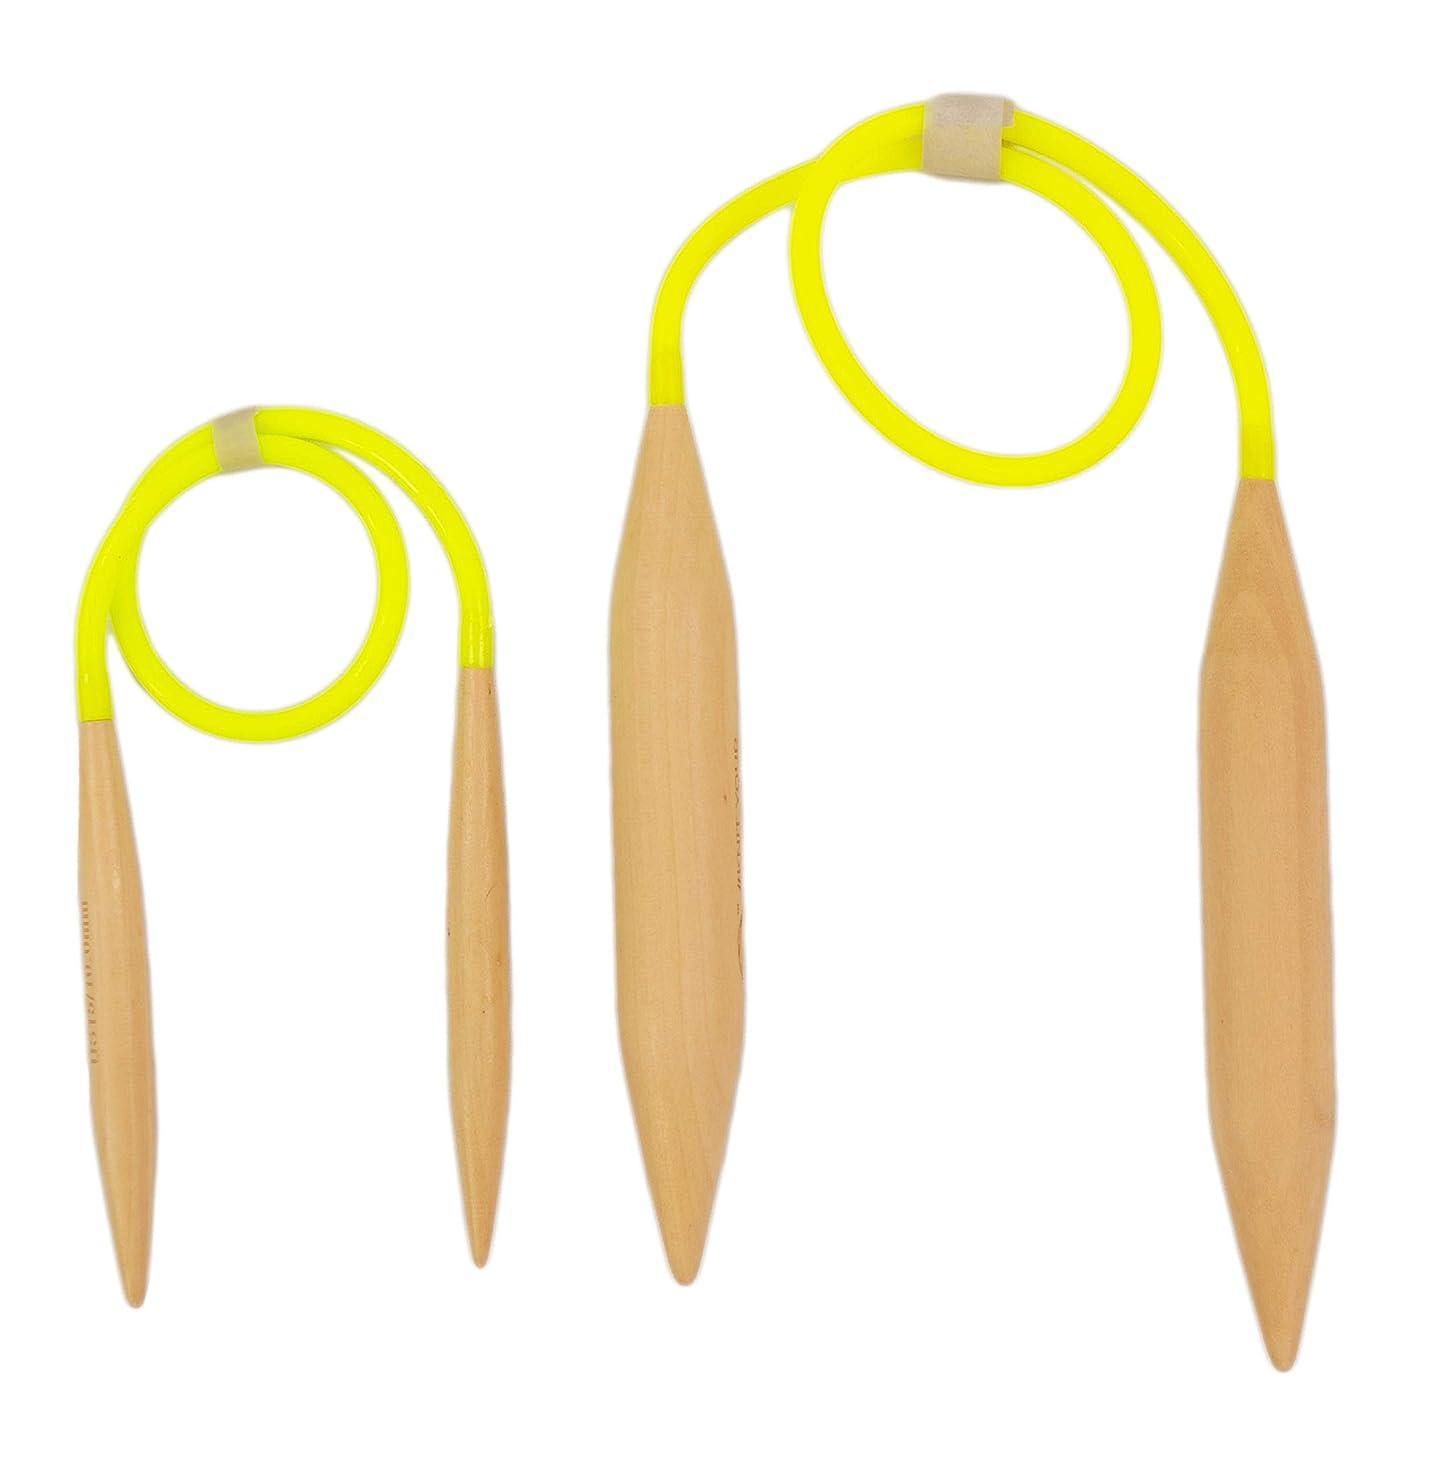 Large & Medium Size Wood Circular Knitting Needles Set, Thick US 36 20mm 24 inch, Short US15 10mm 16 inch